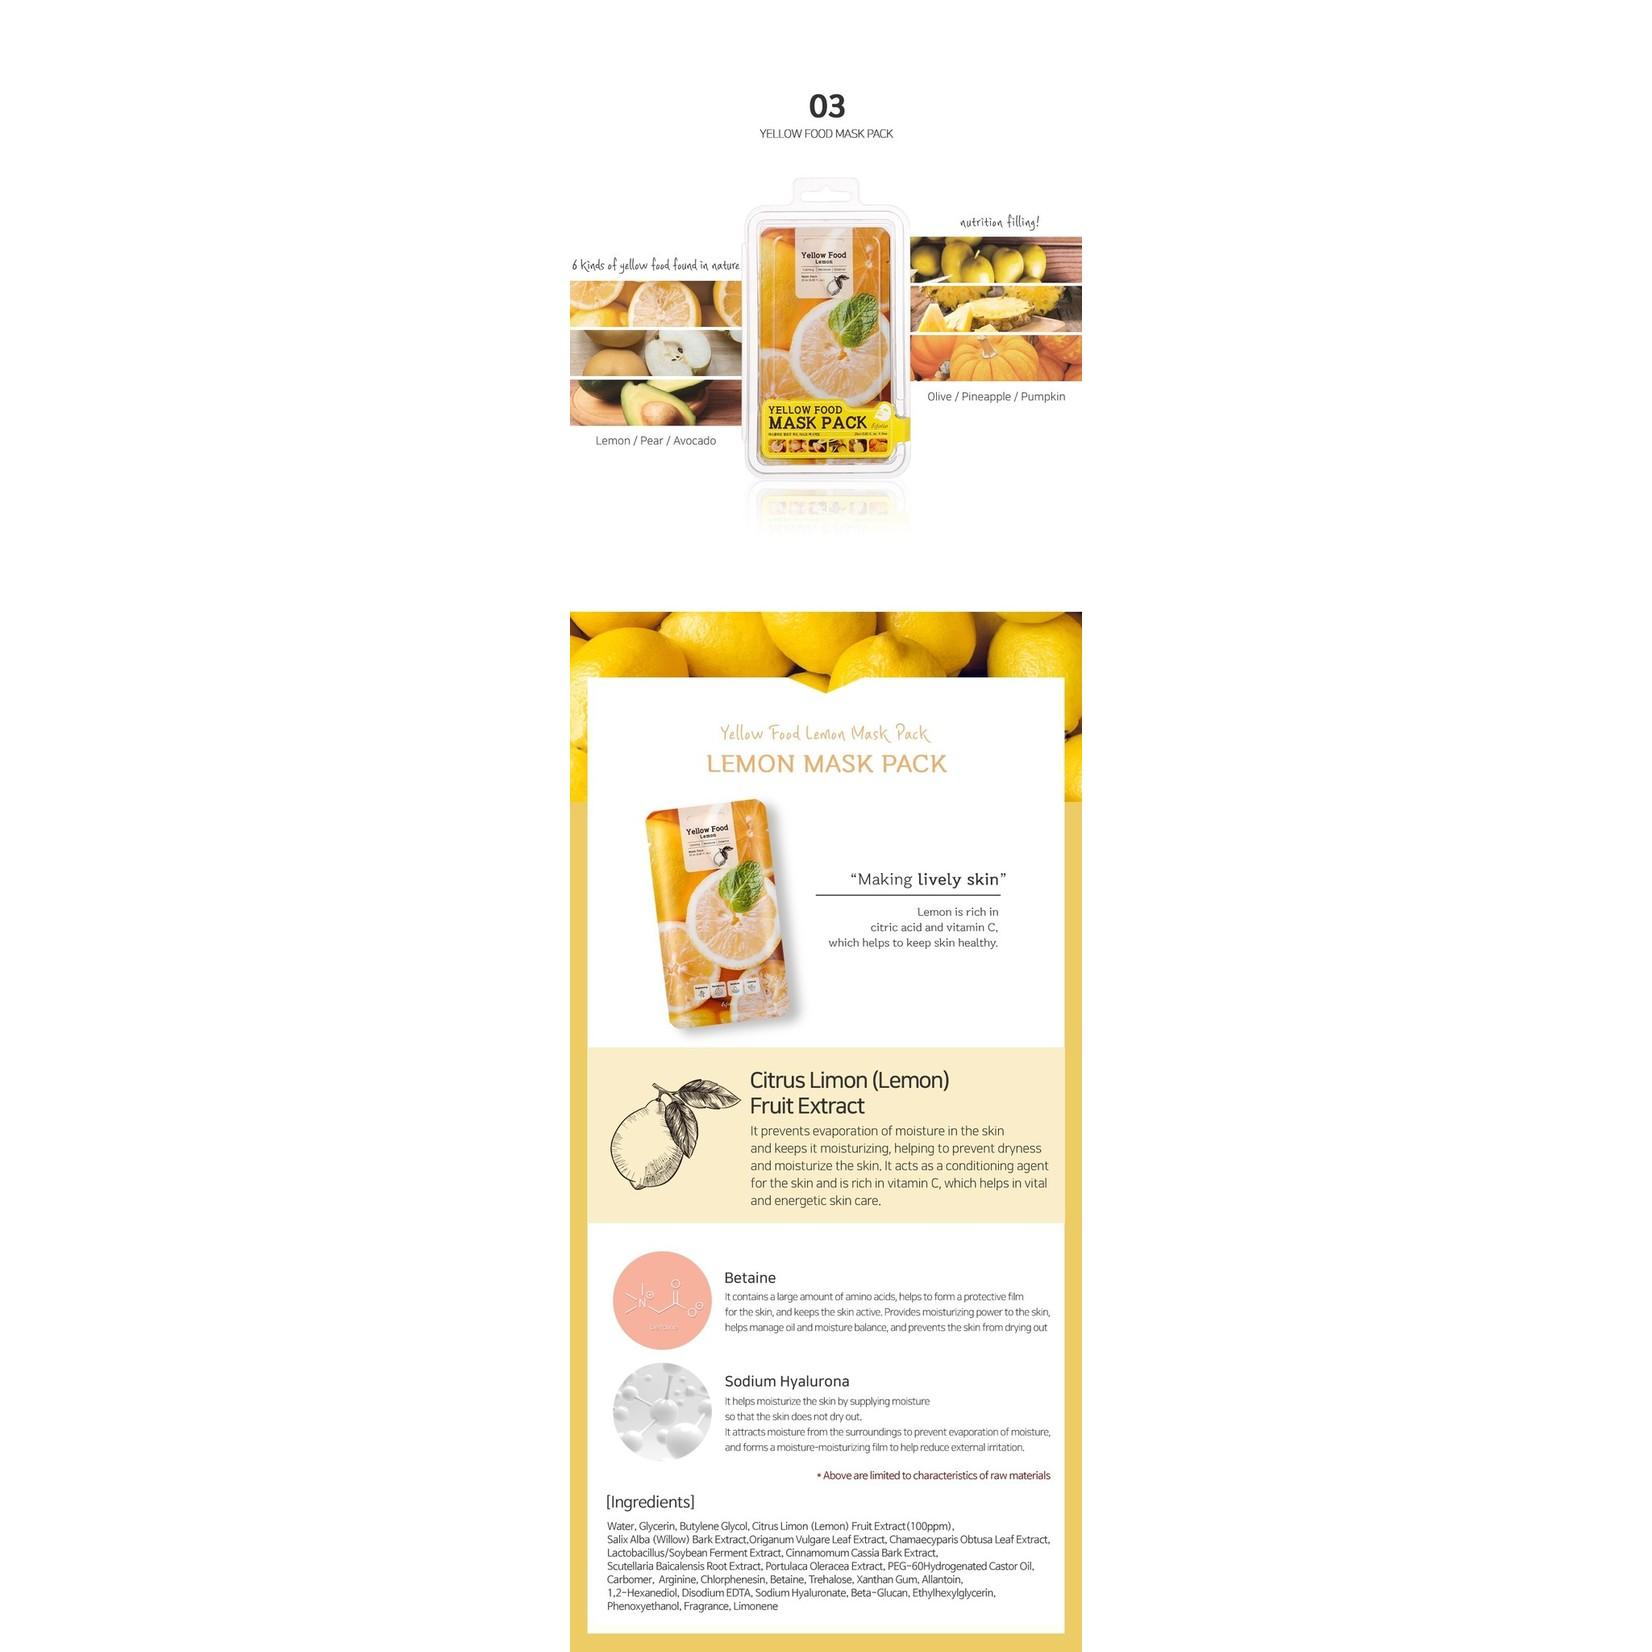 esfolio Yellow Food Lemon Mask